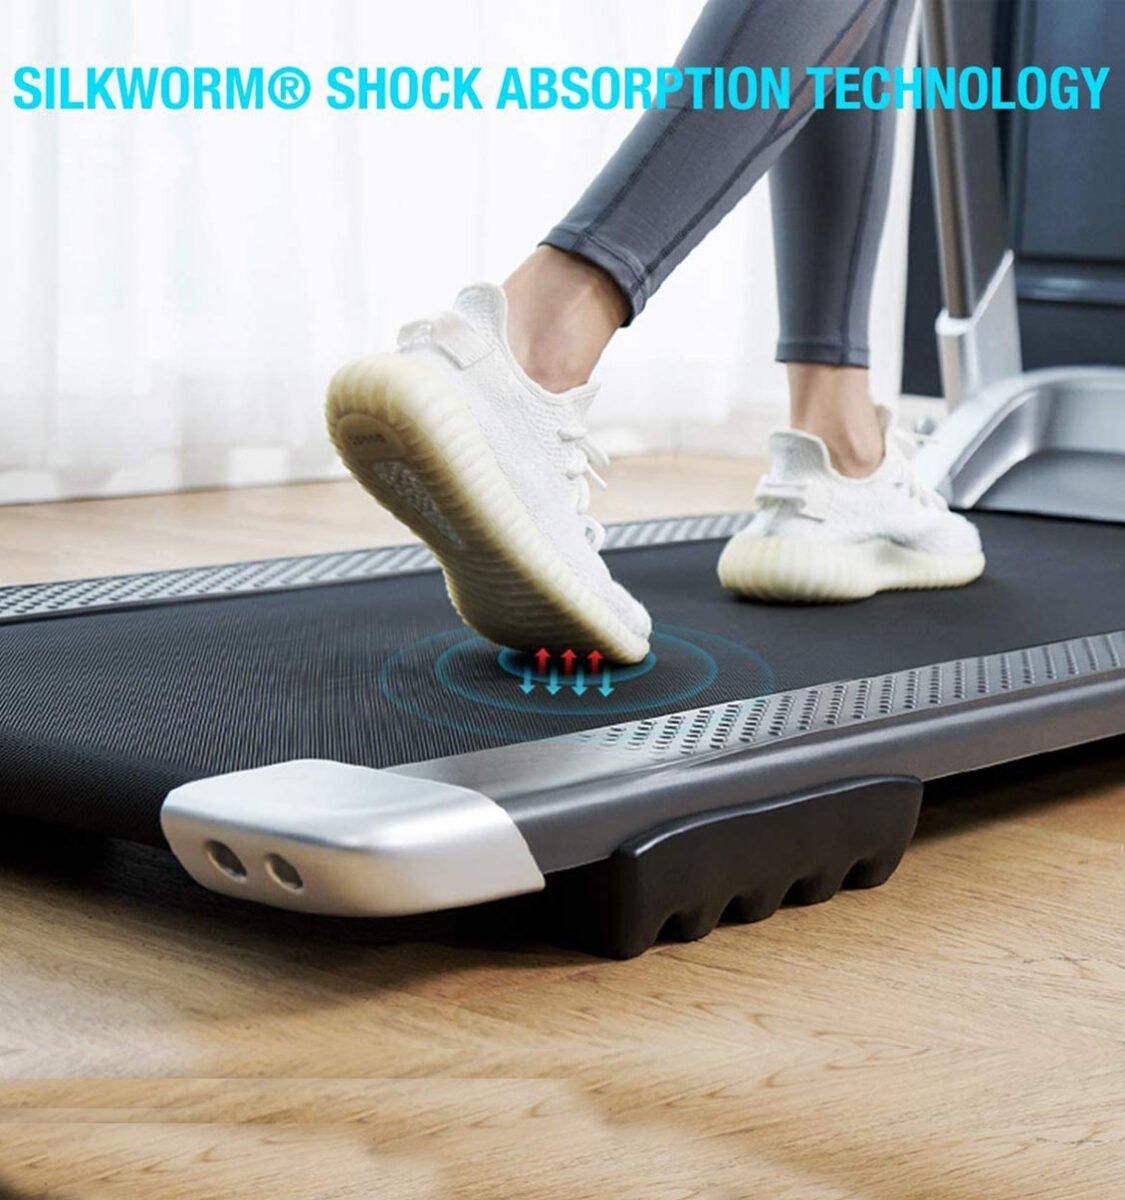 OVICX Q2S Folding Portable Treadmill Cushion System Shock Absorber